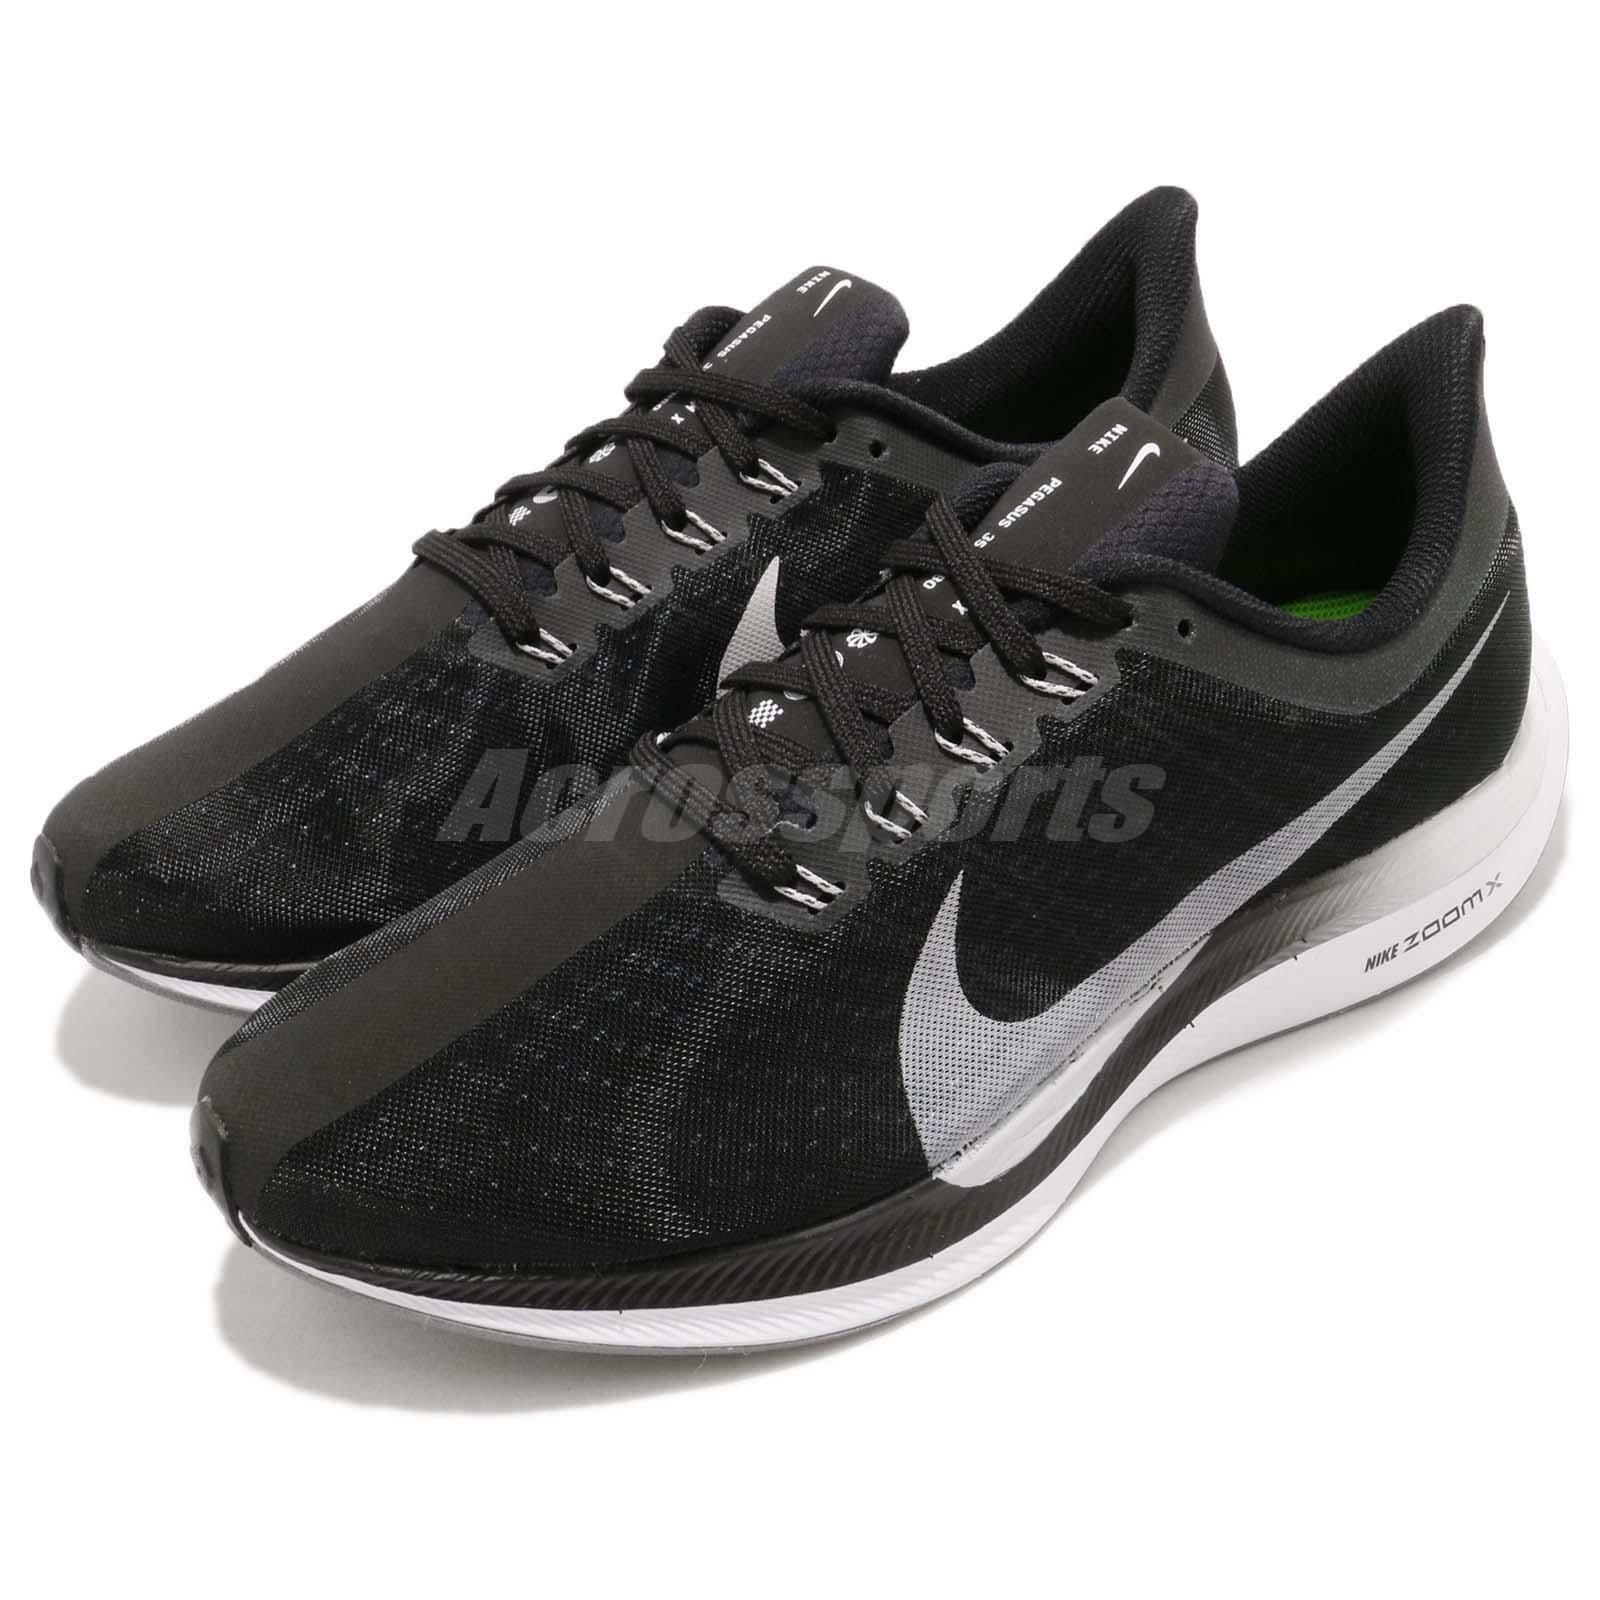 Nike Nike Nike zoom pegasus 35 turbo mens scarpe da corsa zoomx runner scarpe da ginnastica - 1 | tender  | Scolaro/Ragazze Scarpa  e64823